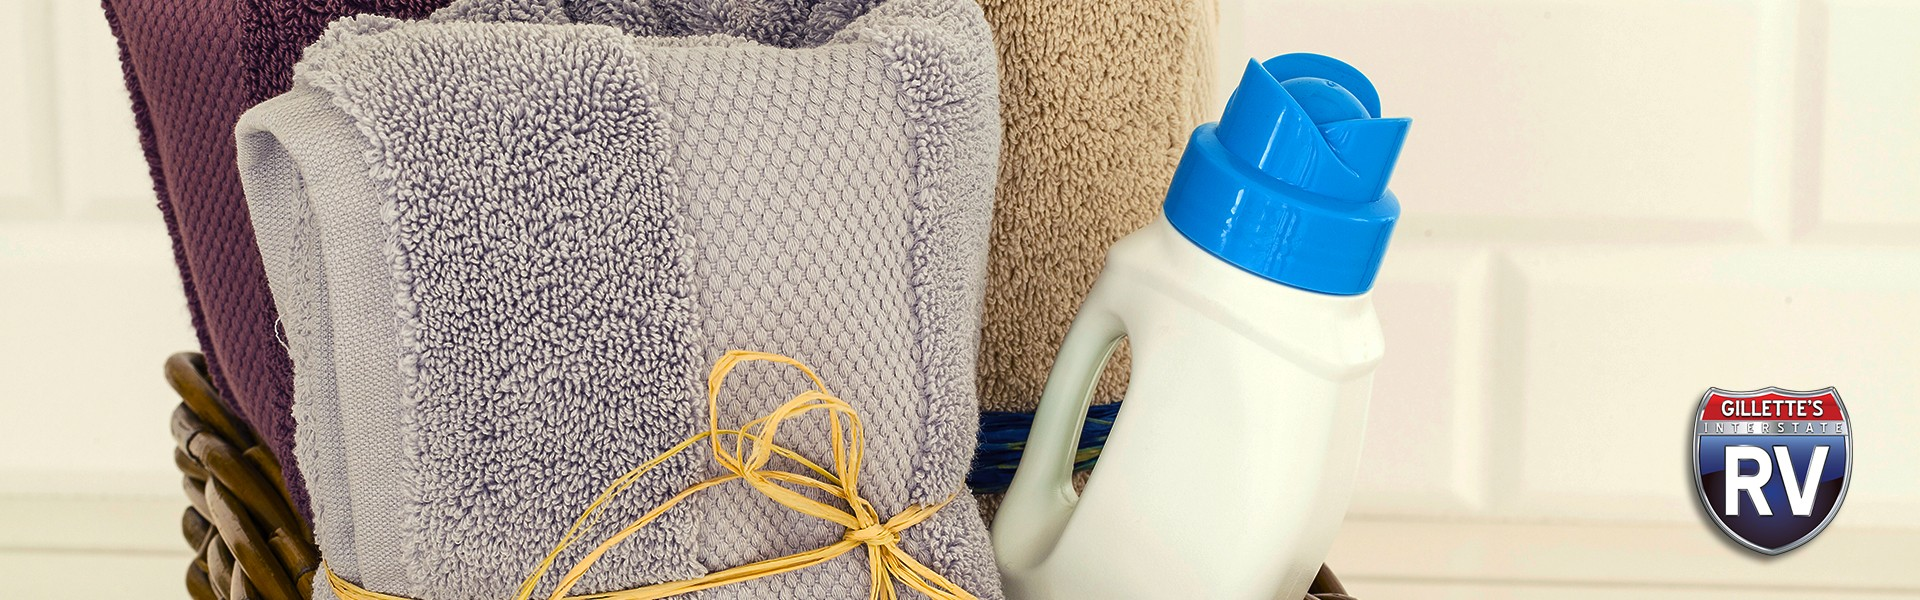 Homemade laundry detergent and fabric softener